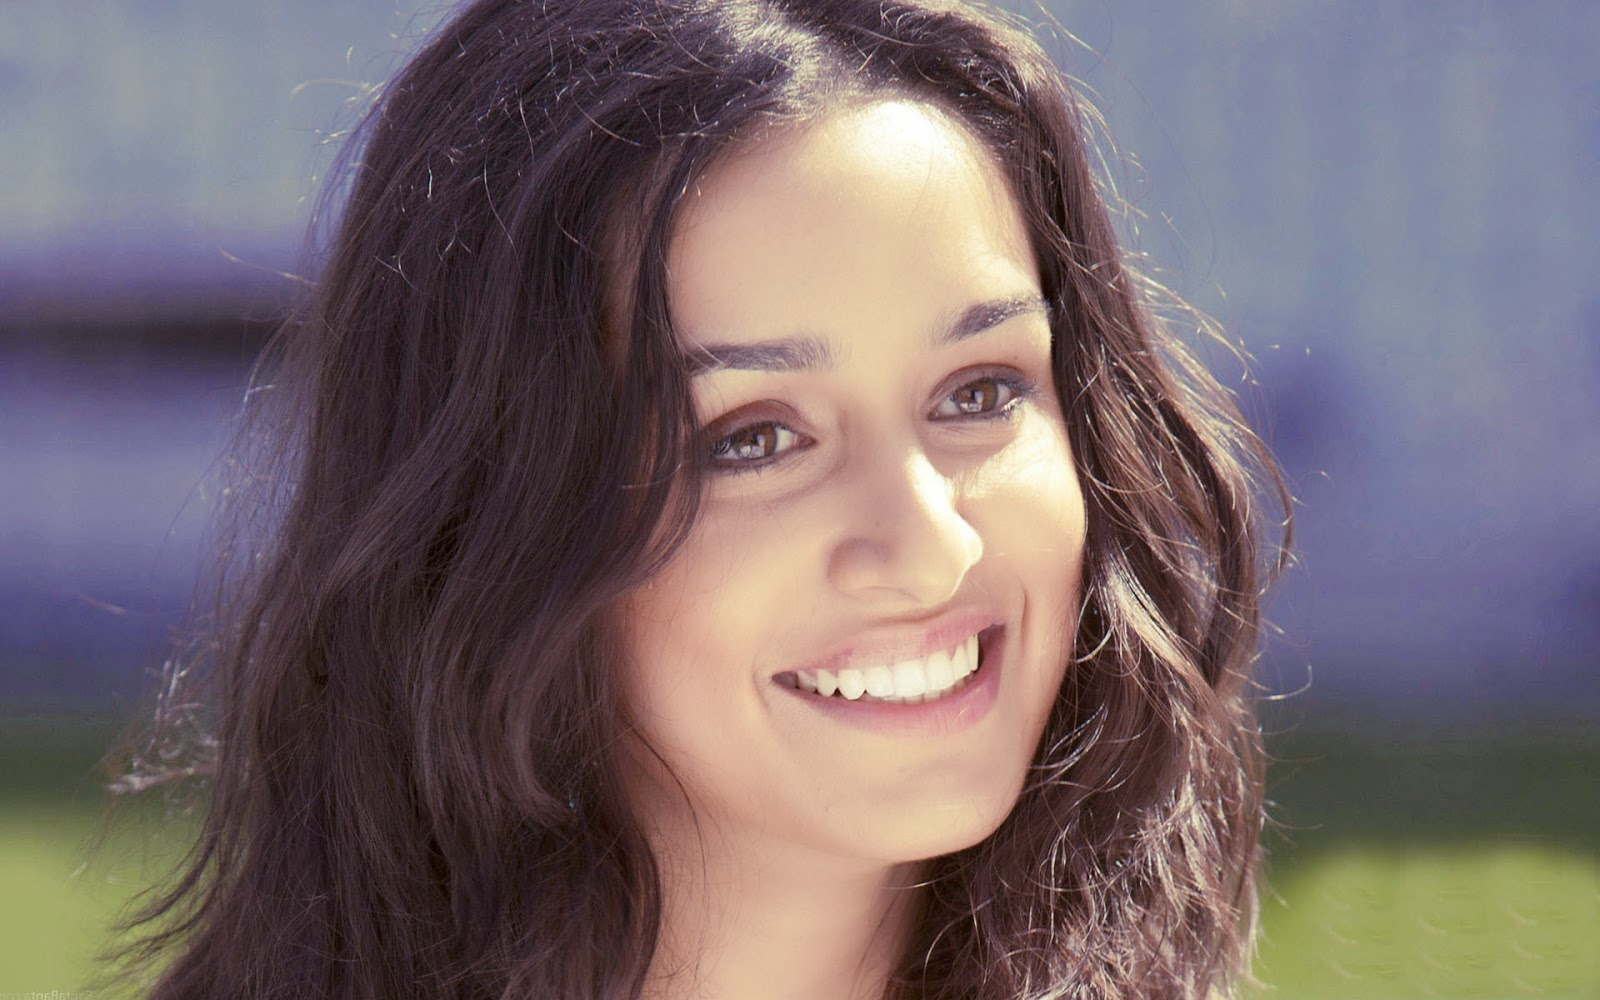 Cute Smile Shraddha Kapoor HD Photo Wallpaper